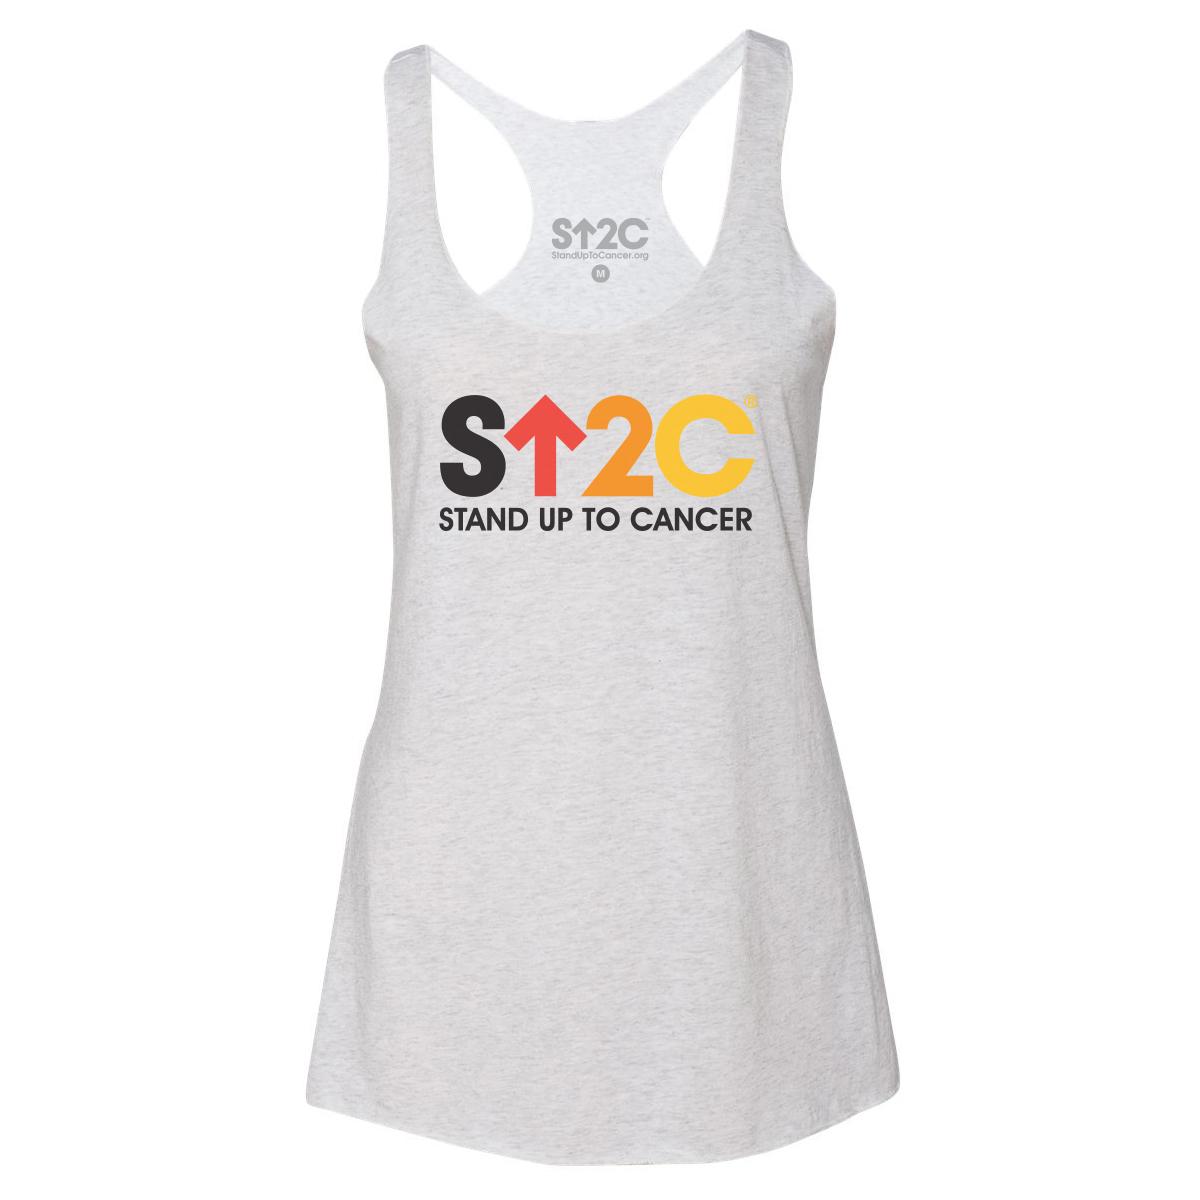 SU2C Short Logo Women's Racerback Tank (Heather White)